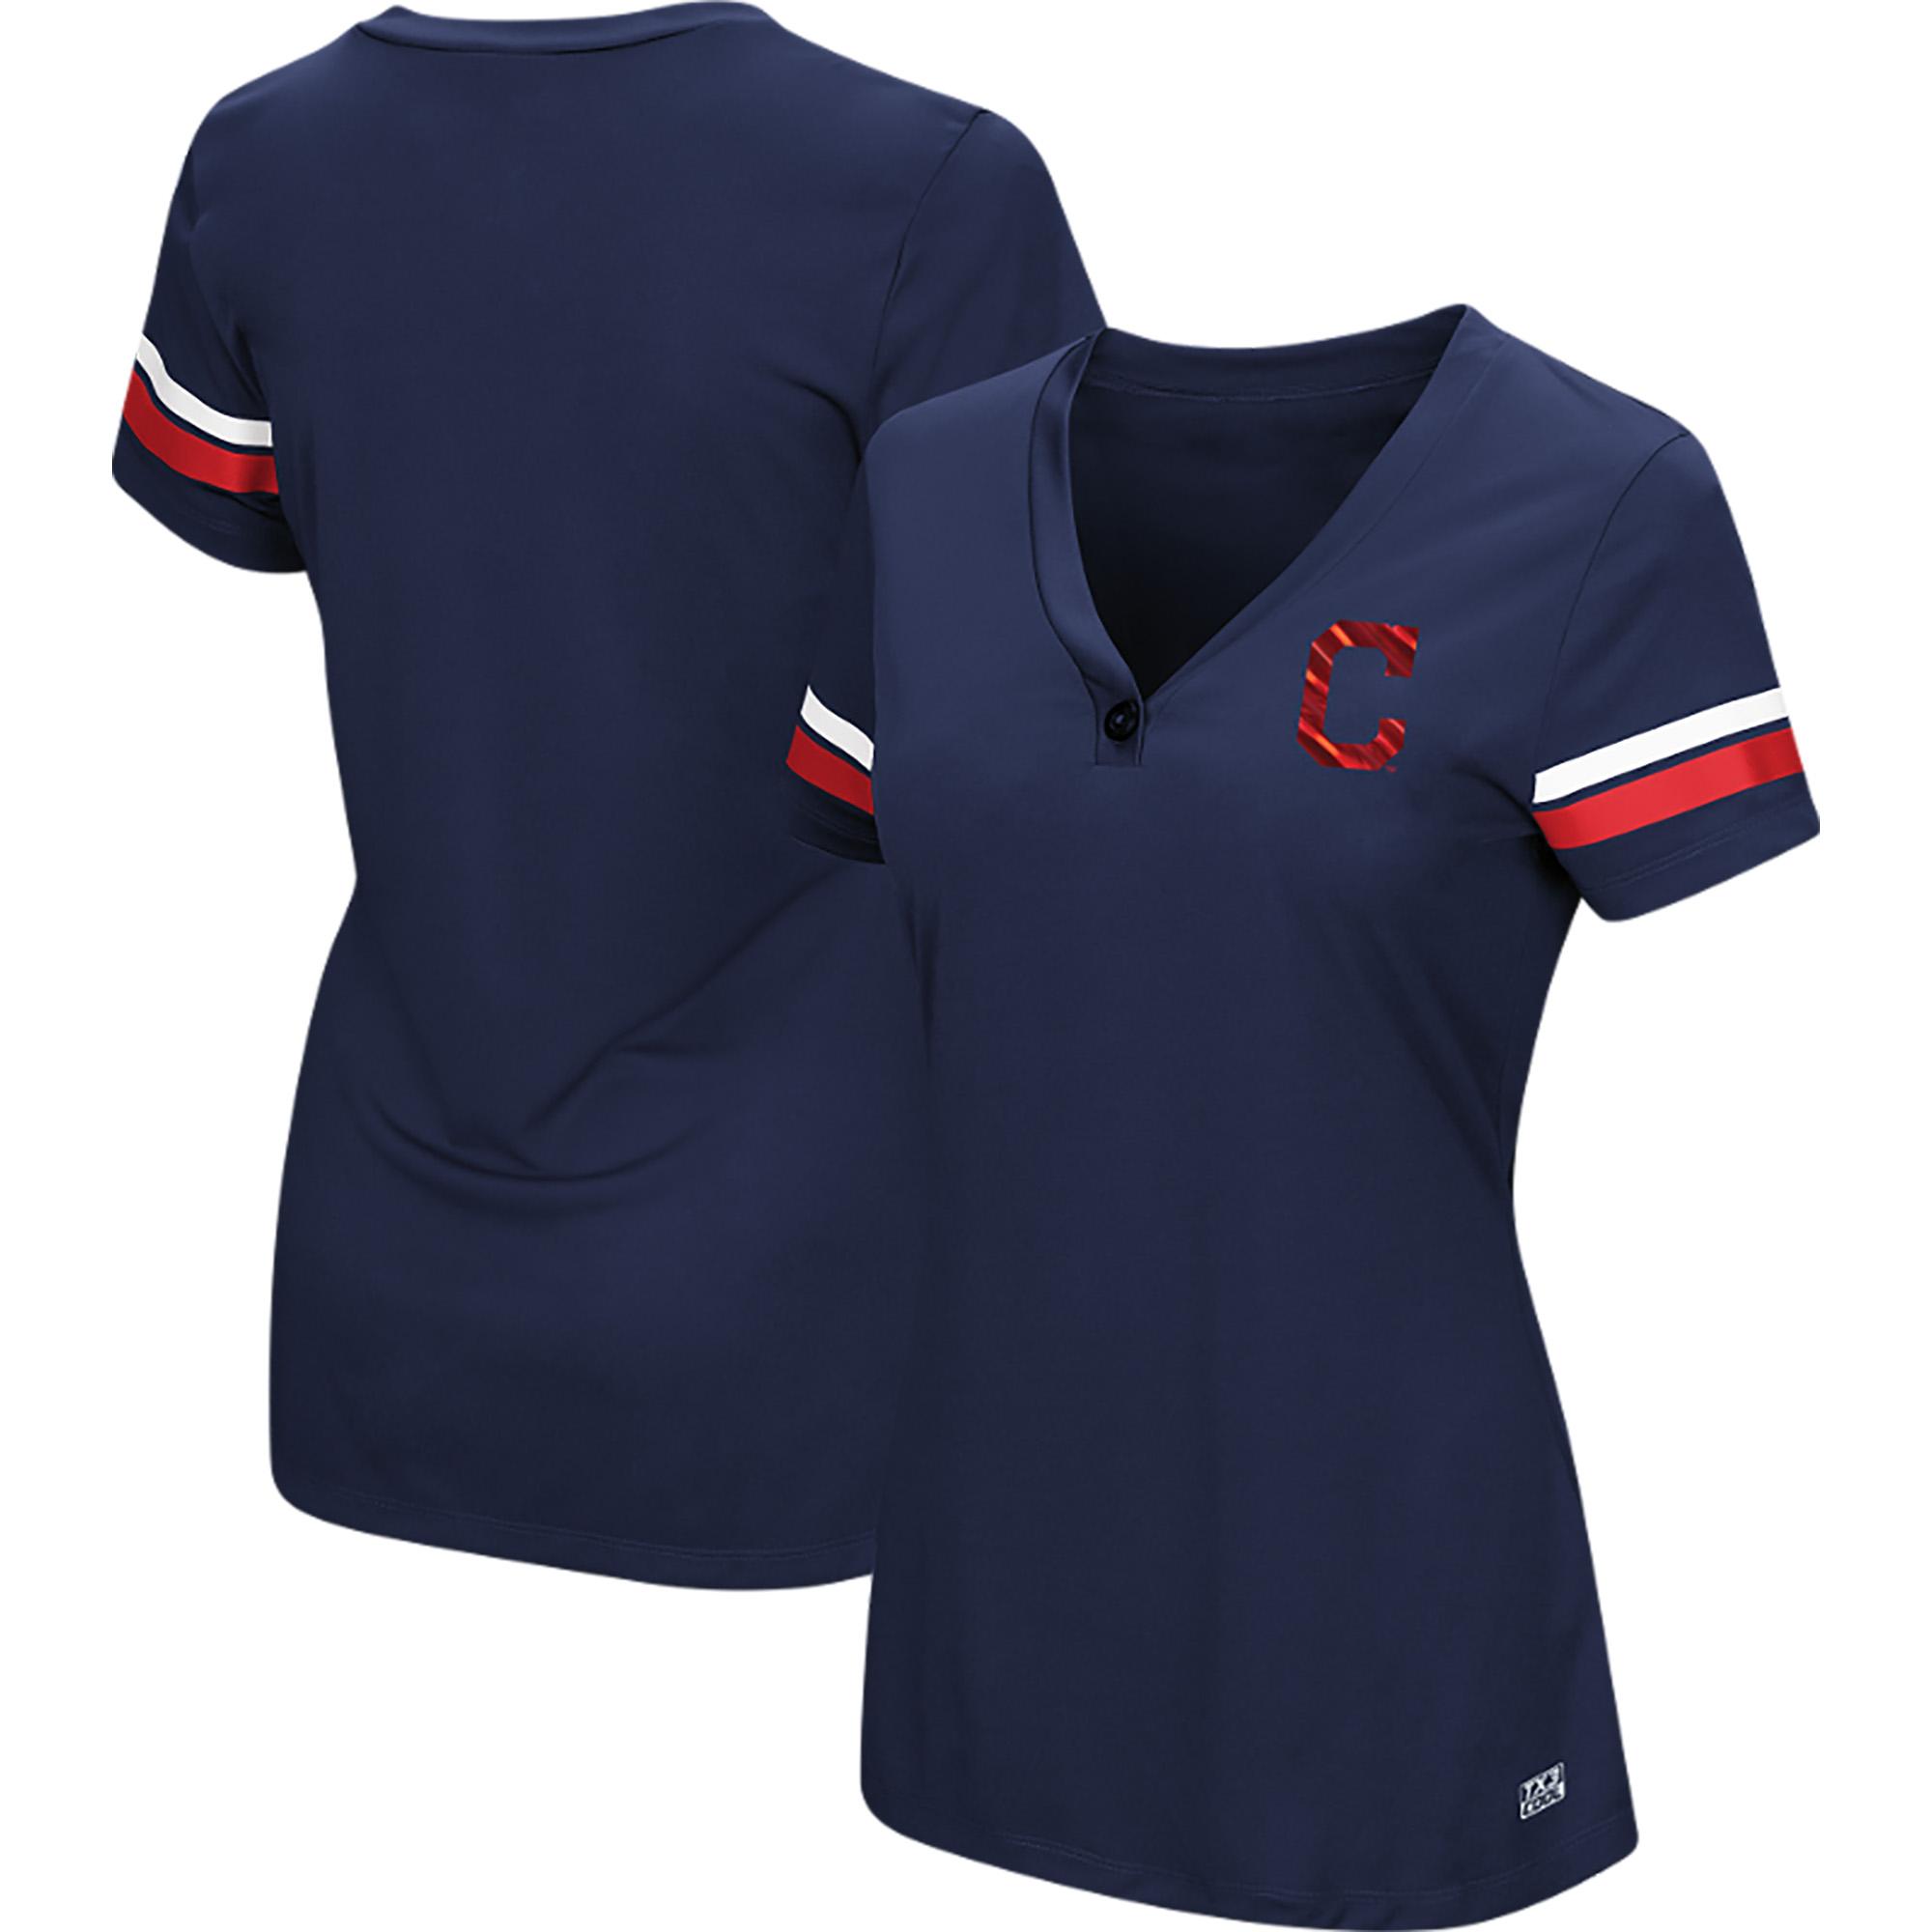 Women's Majestic Navy Cleveland Indians Plus Size Sparkling Fun Button V-Neck T-Shirt